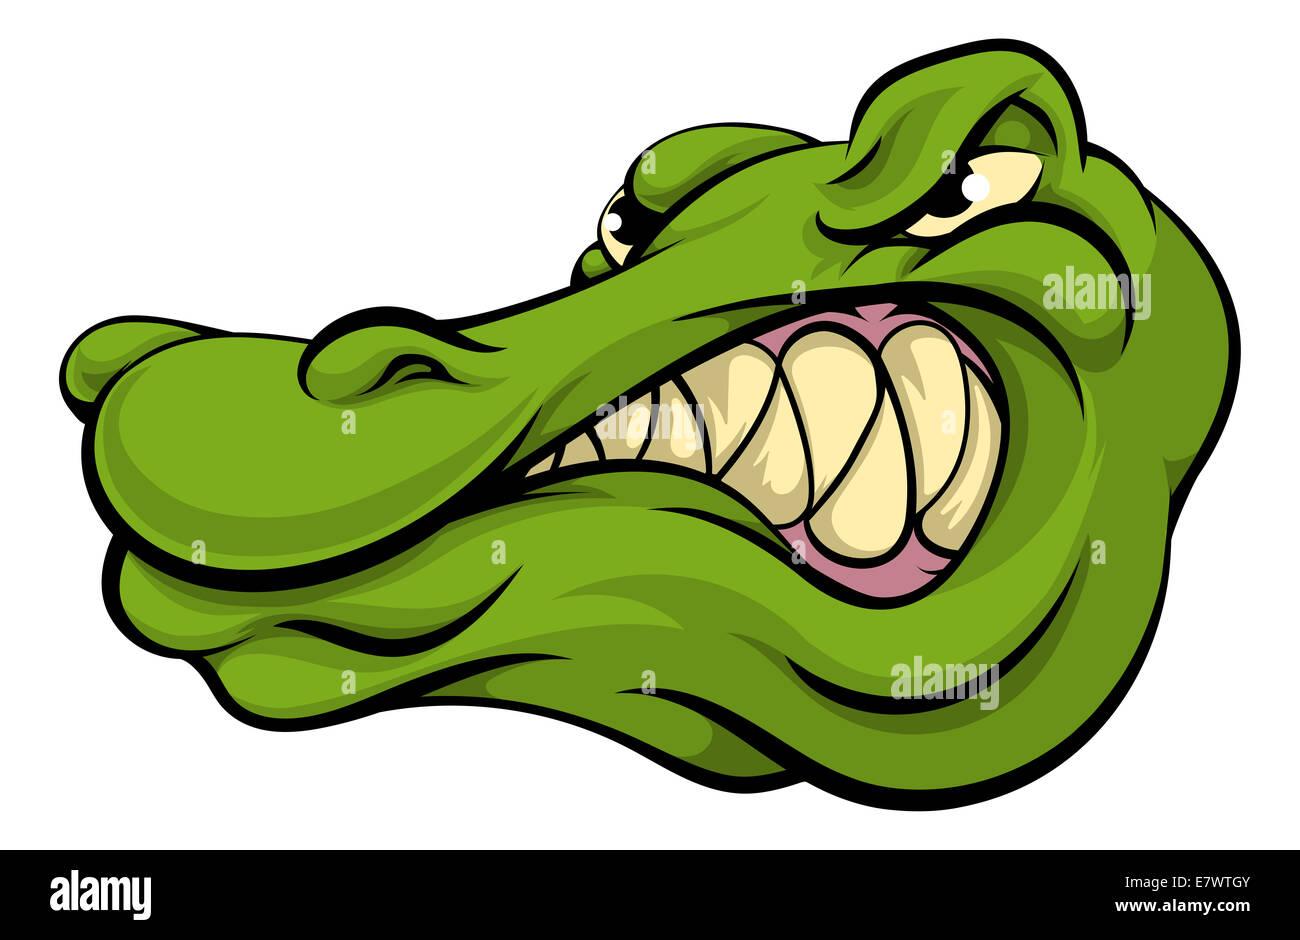 a crocodile or alligator cartoon character sports mascot